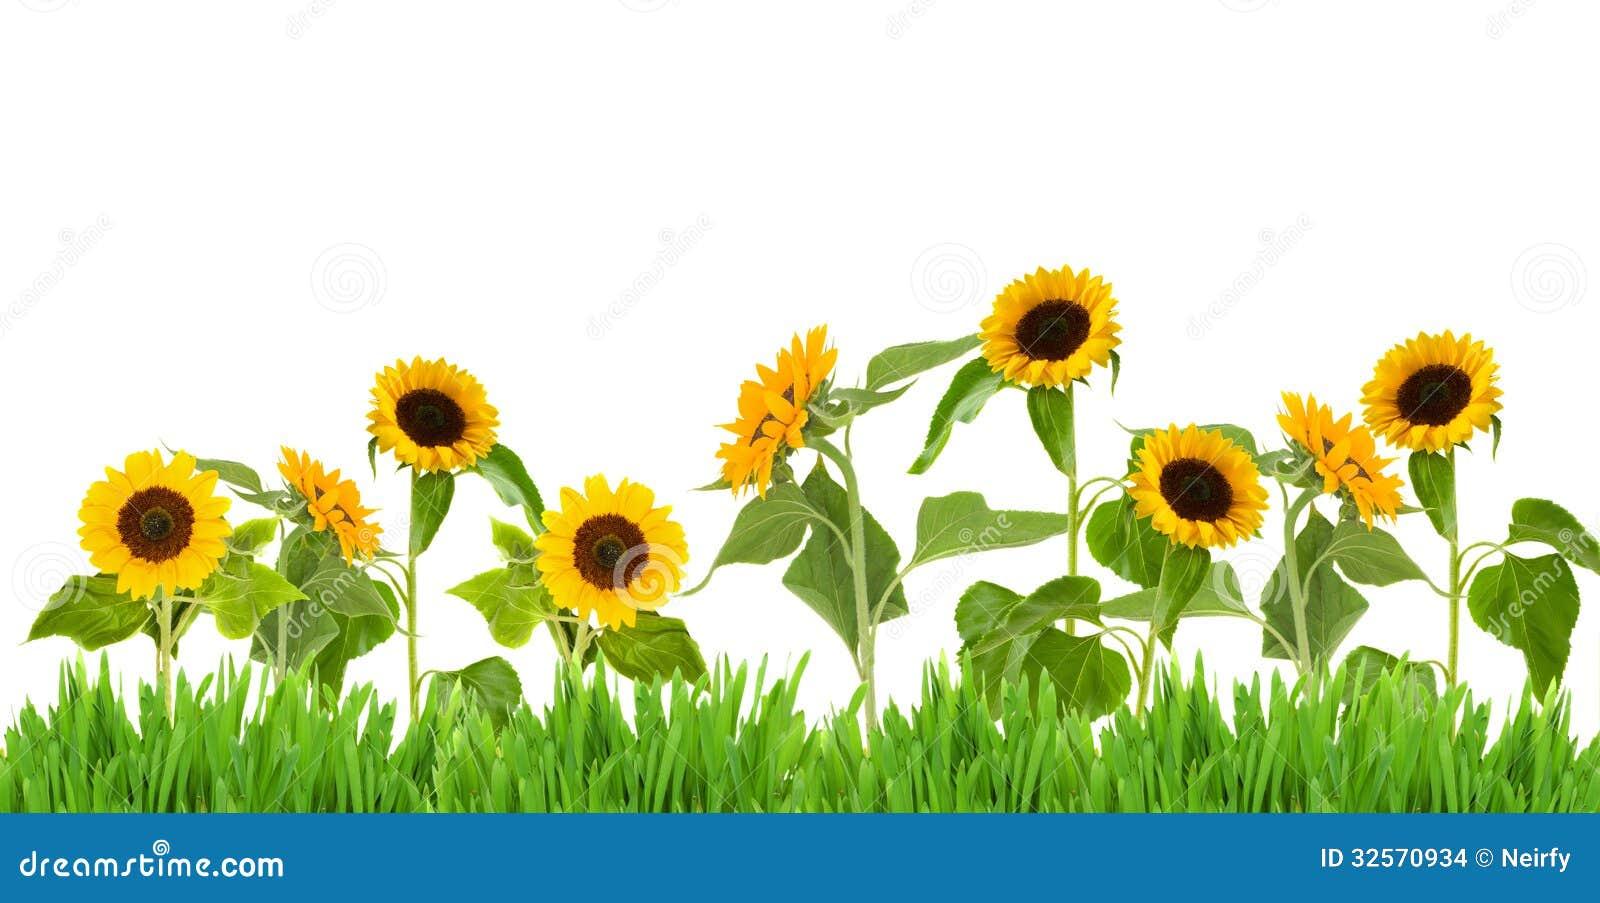 Bight Sunflower Border Stock Images - Image: 32570934